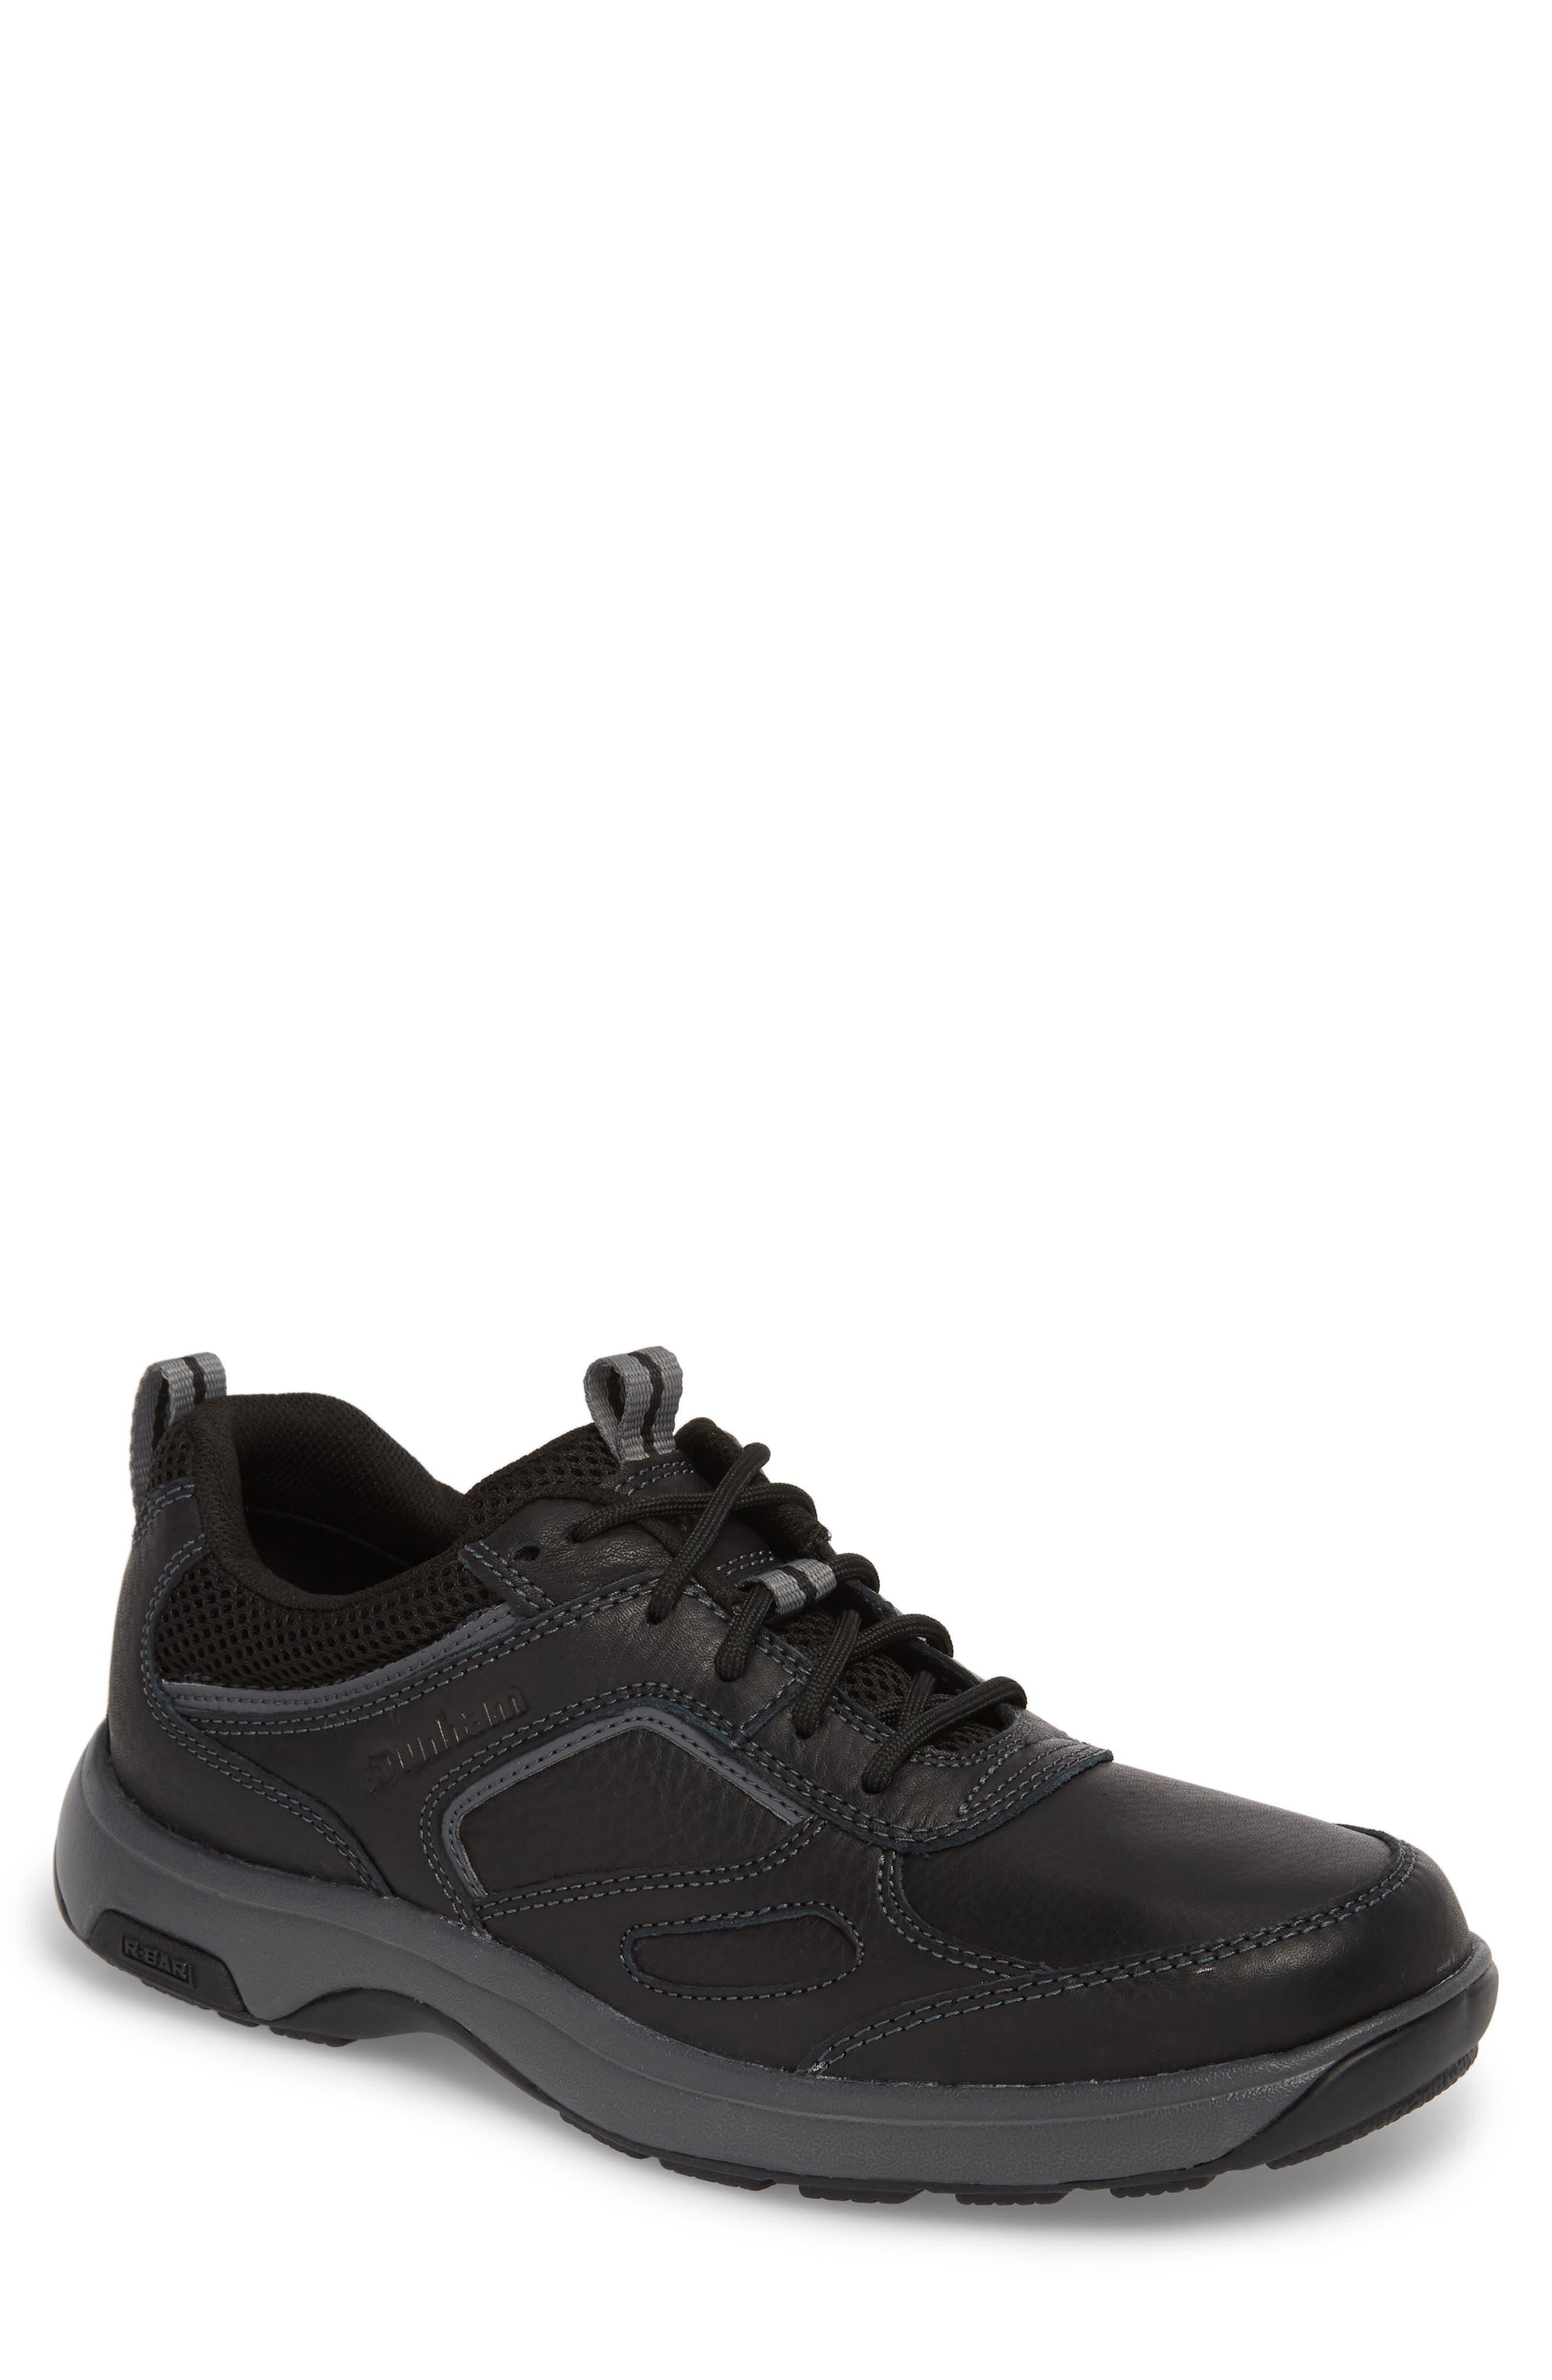 Dunham 8000 Uball Sneaker, EEEE - Black